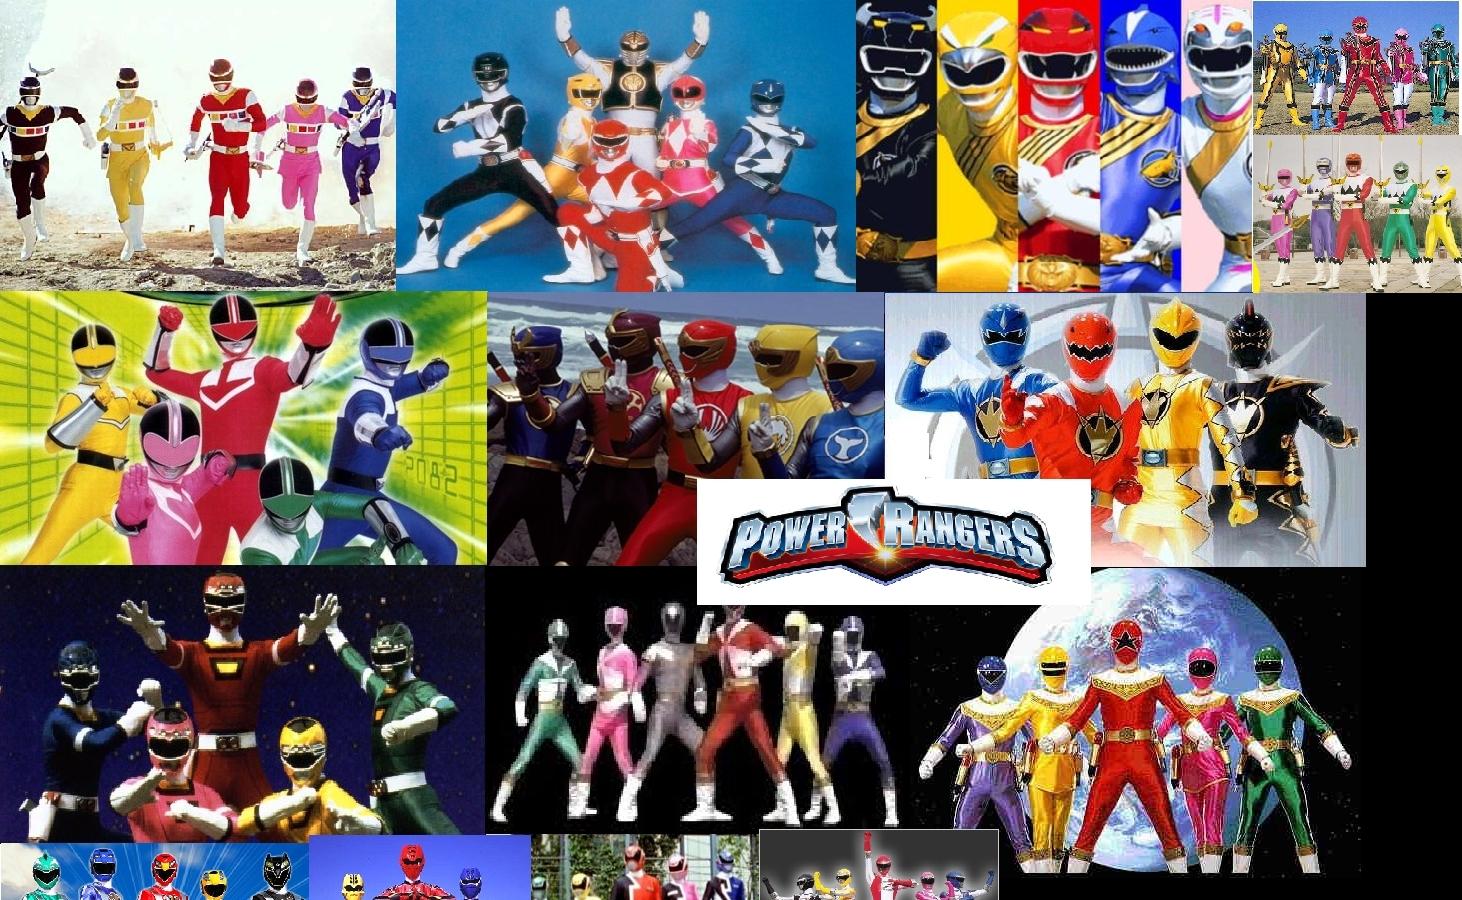 1462x900px Power Rangers Jungle Fury Wallpaper 1462x900